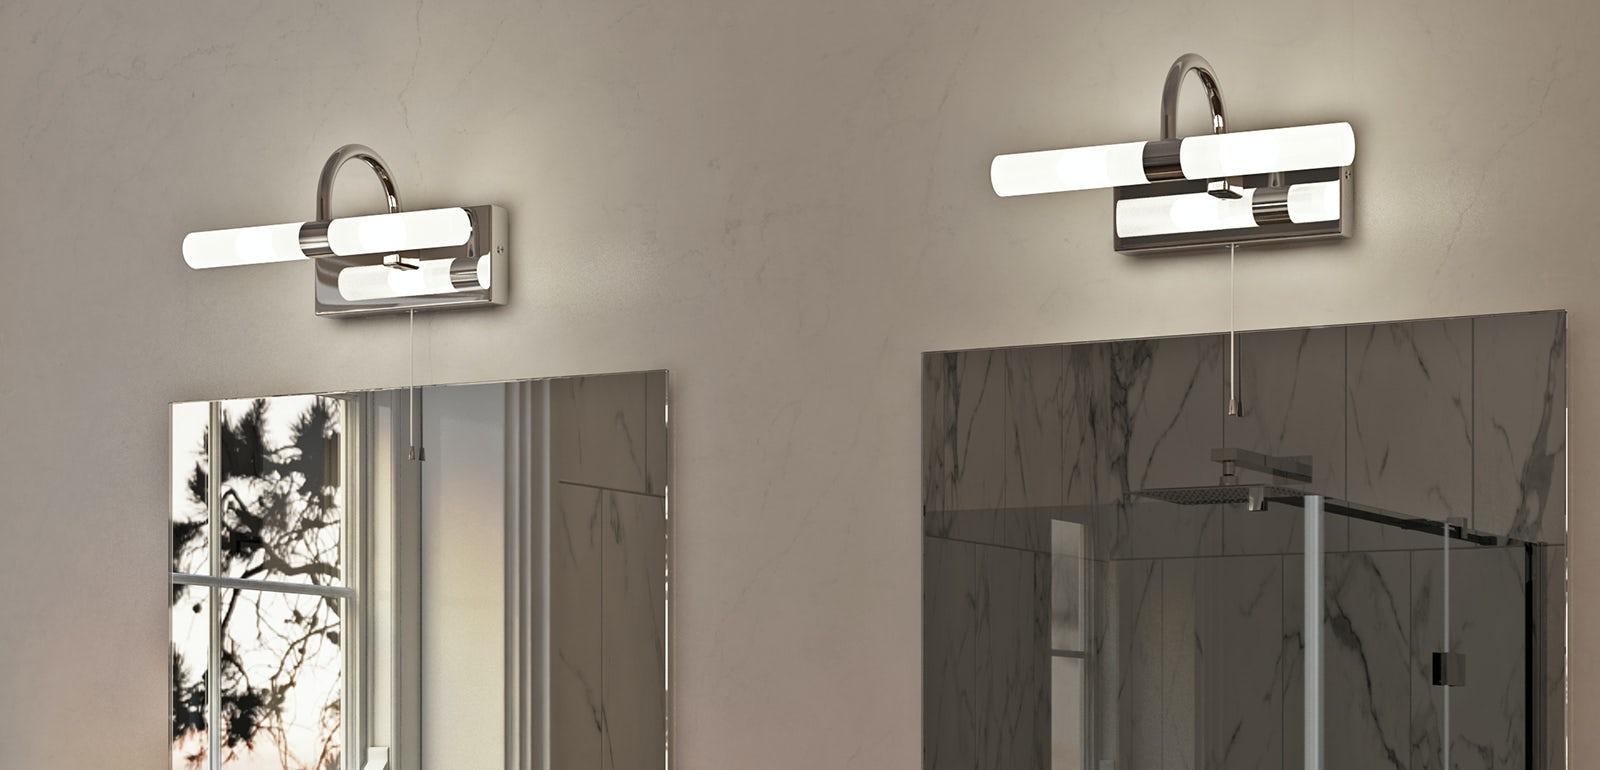 Traditional bathroom ceiling light